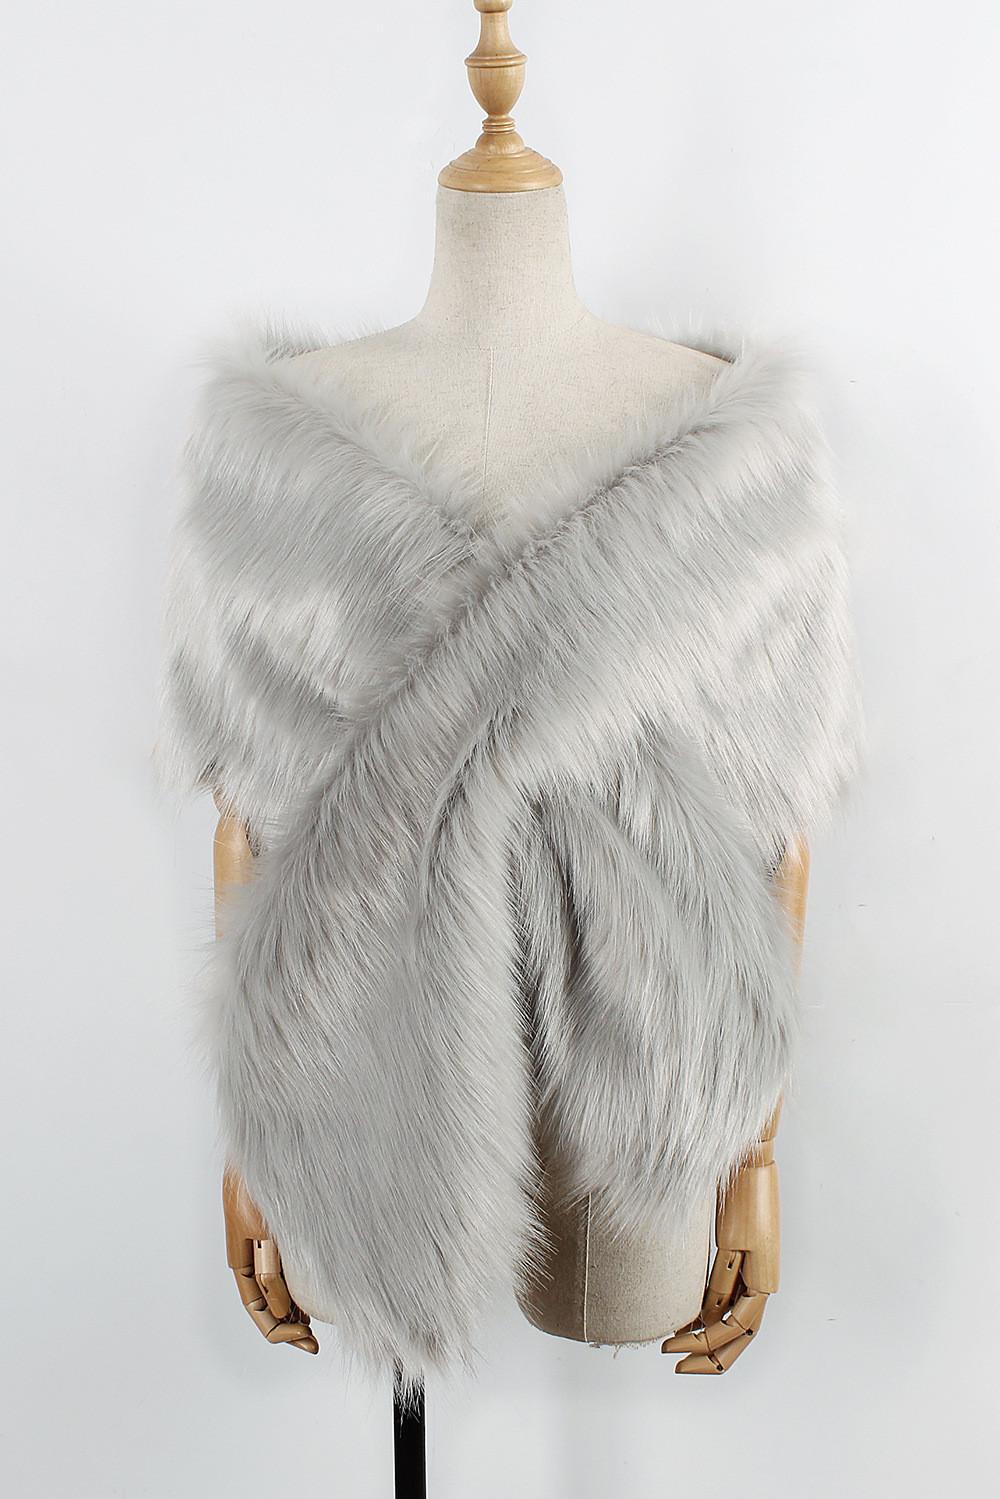 The autumn and winter new imitation fur big cape neck scarf multi-color joker scarf bride dress cross cape (14)